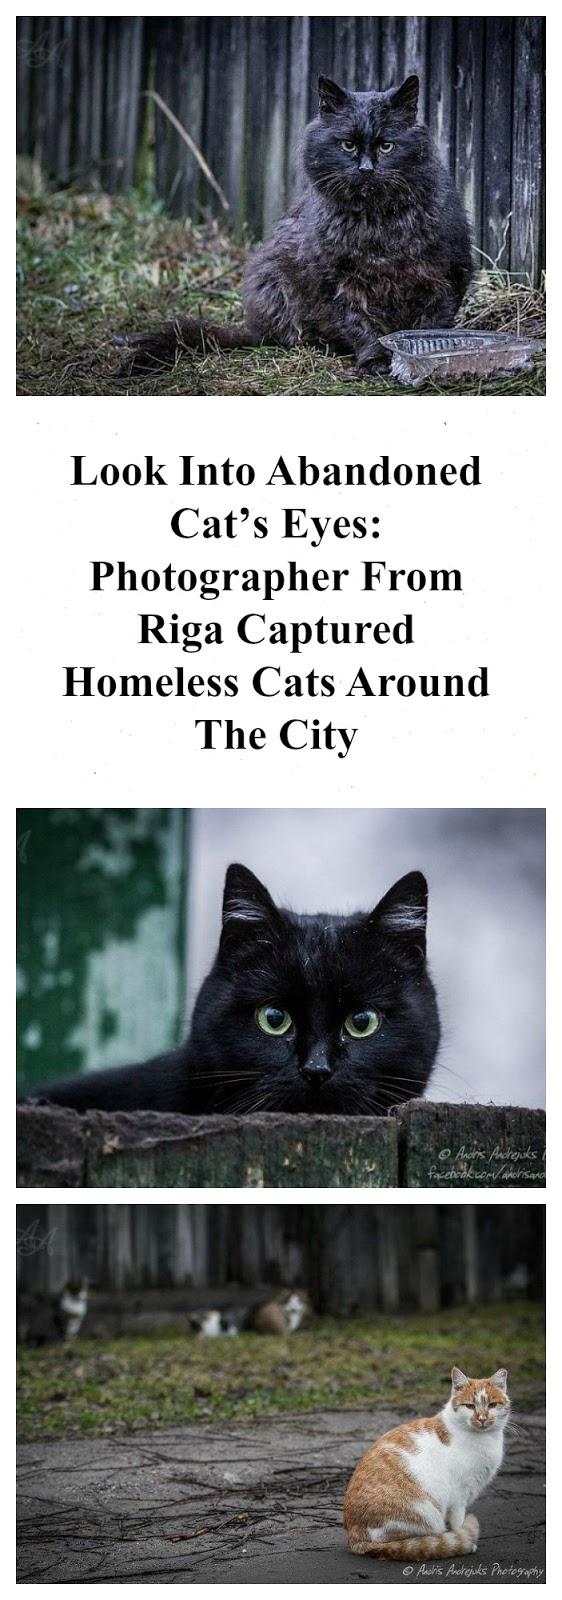 cat's eyes photography